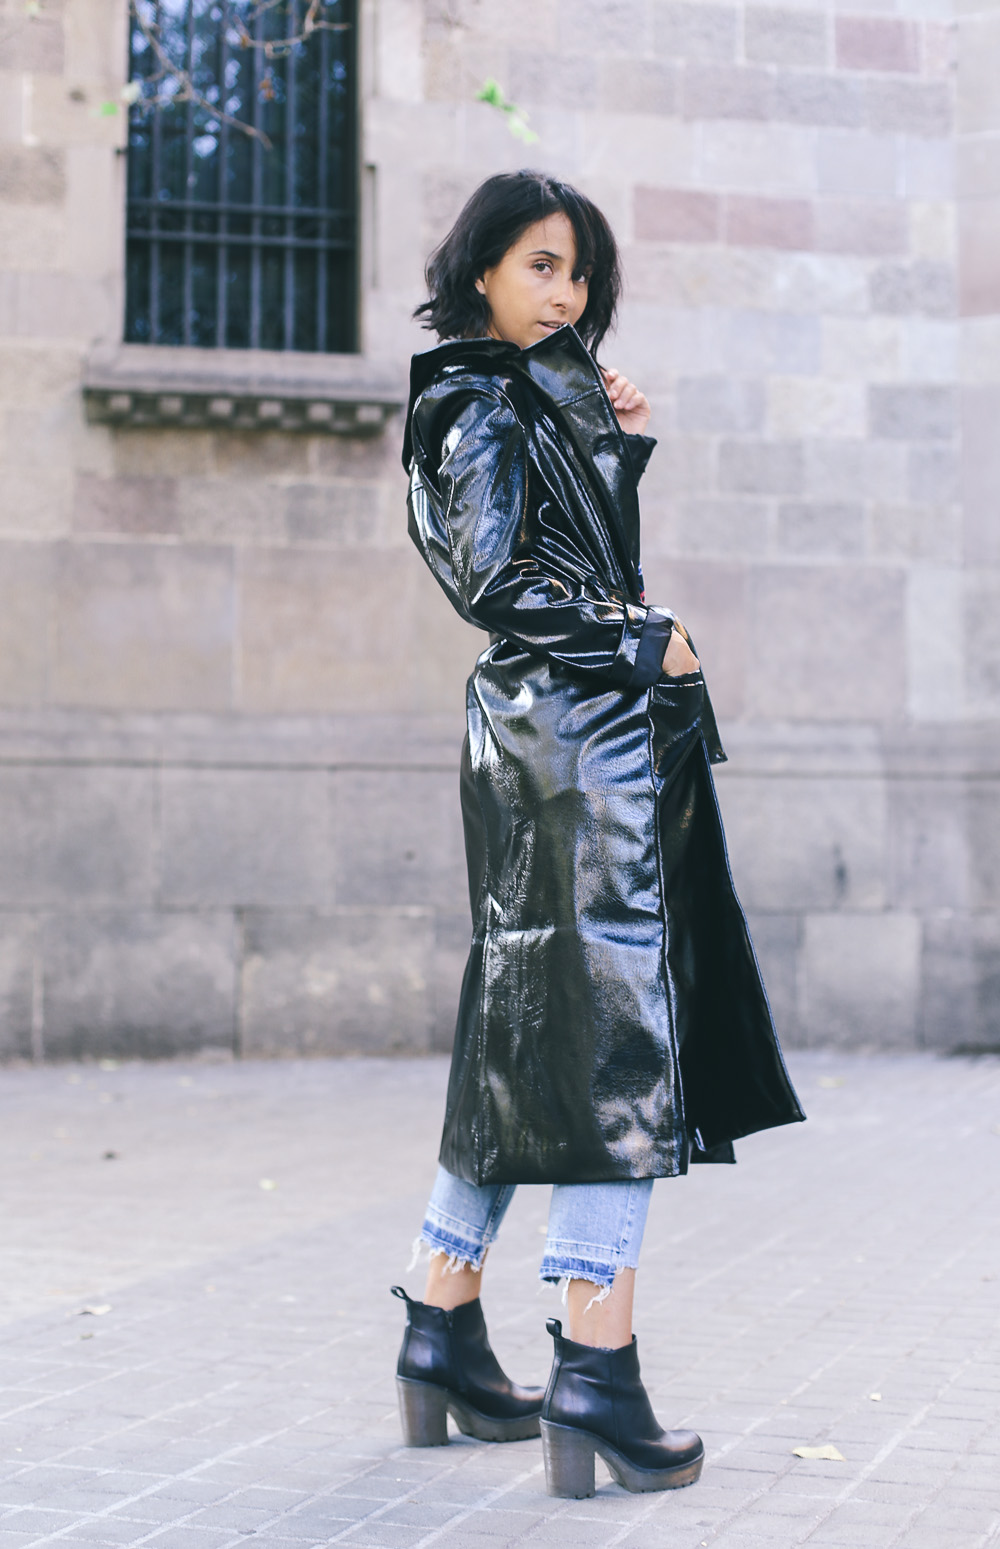 street-style-abrigo-de-charol-IMG_3660